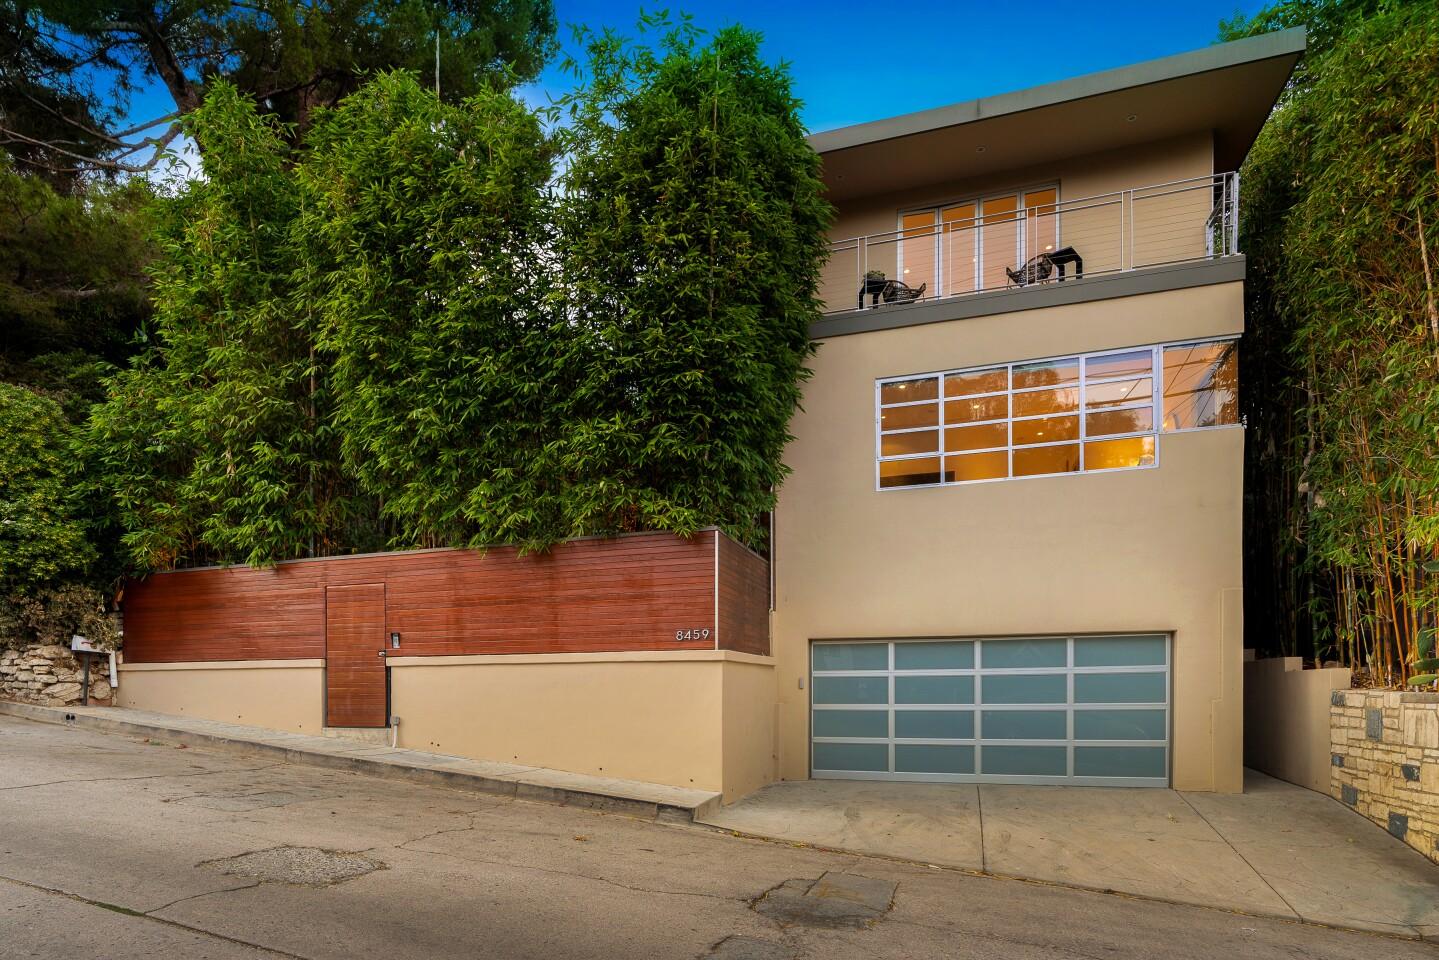 Josh Lucas' Hollywood Hills home